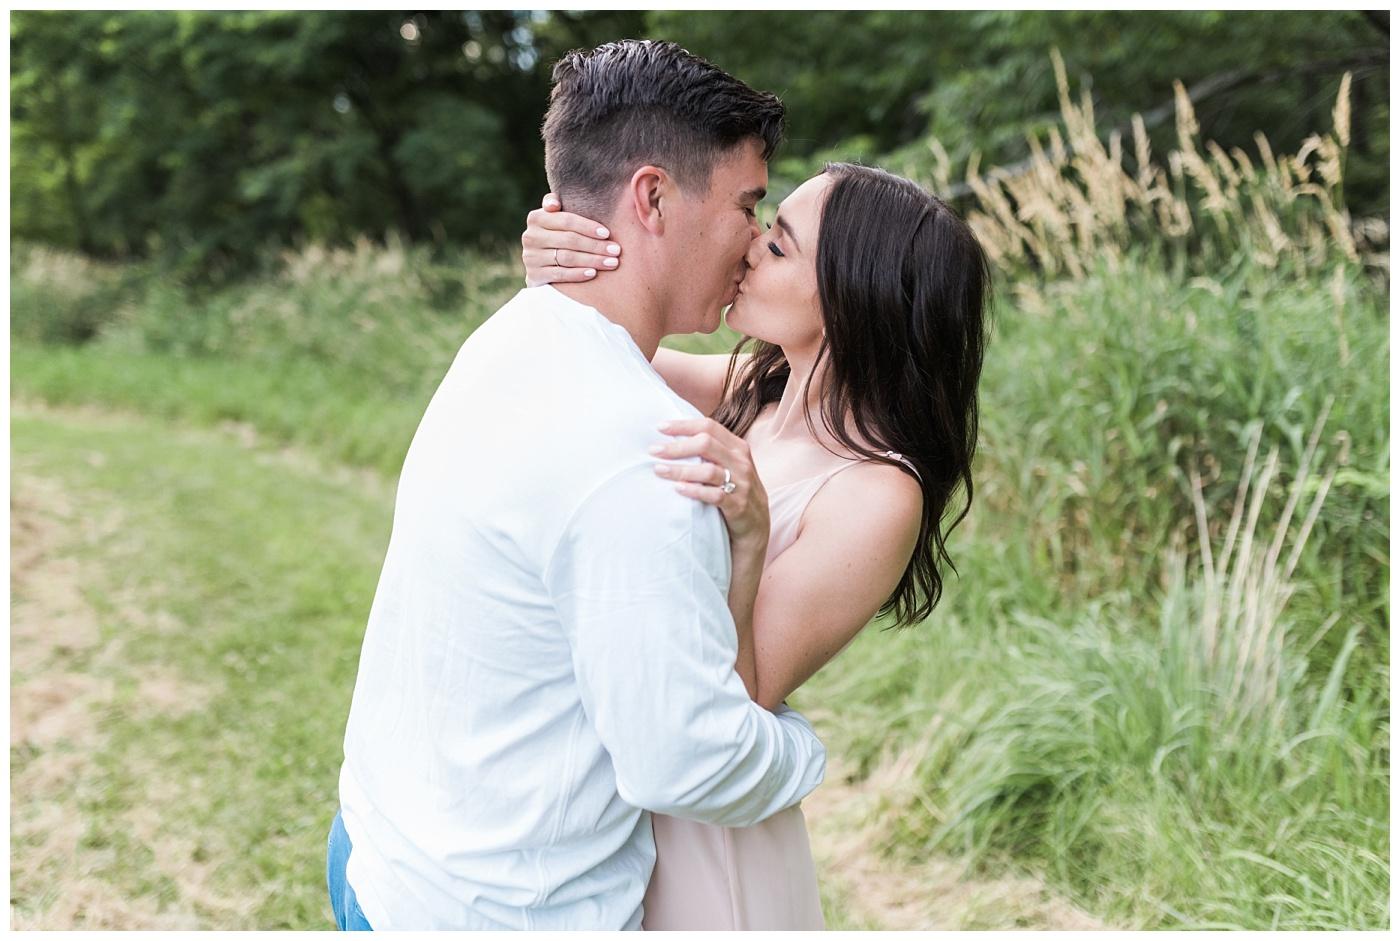 Stephanie Marie Photography Lake McBride Dockside Engagement Session Iowa City Wedding Photographer Madison Sean_0011.jpg